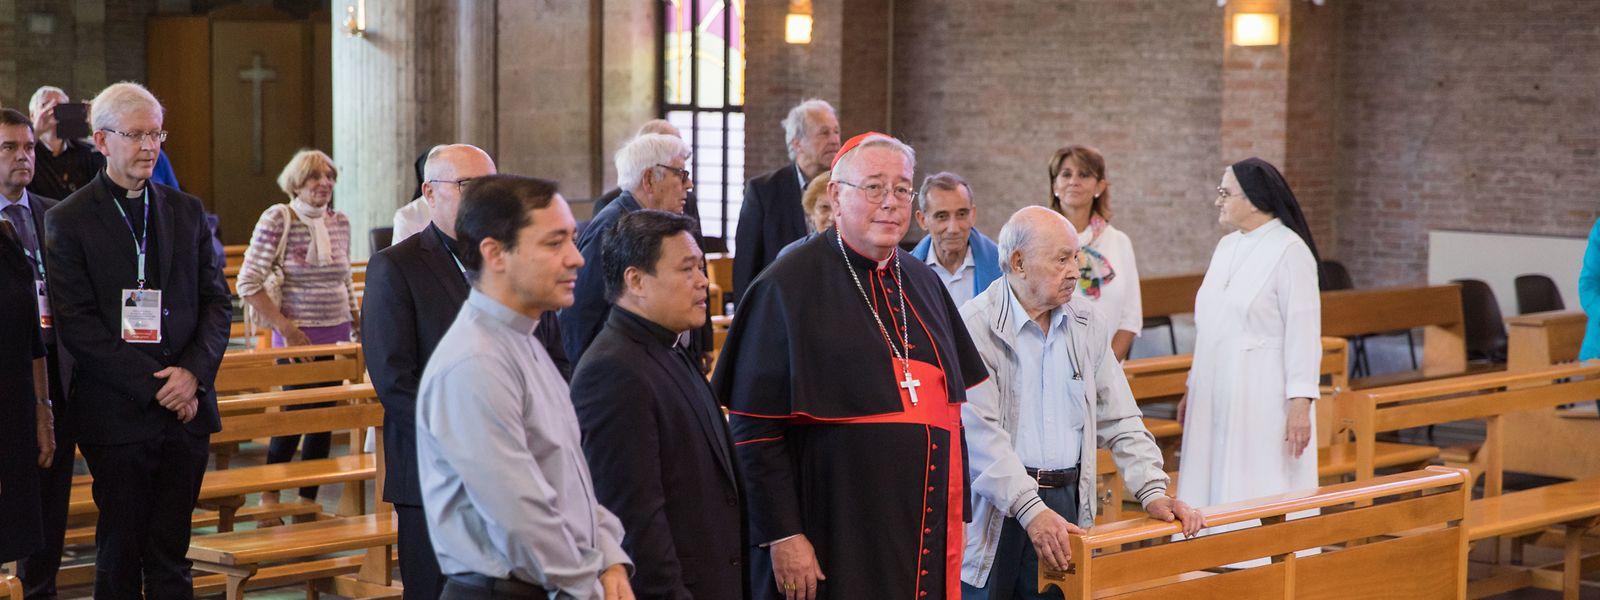 Jean-Claude Hollerich (Mitte) darf sich nun Kardinalpriester von San Giovanni Crisostomo a Monte Sacro Alto nennen.